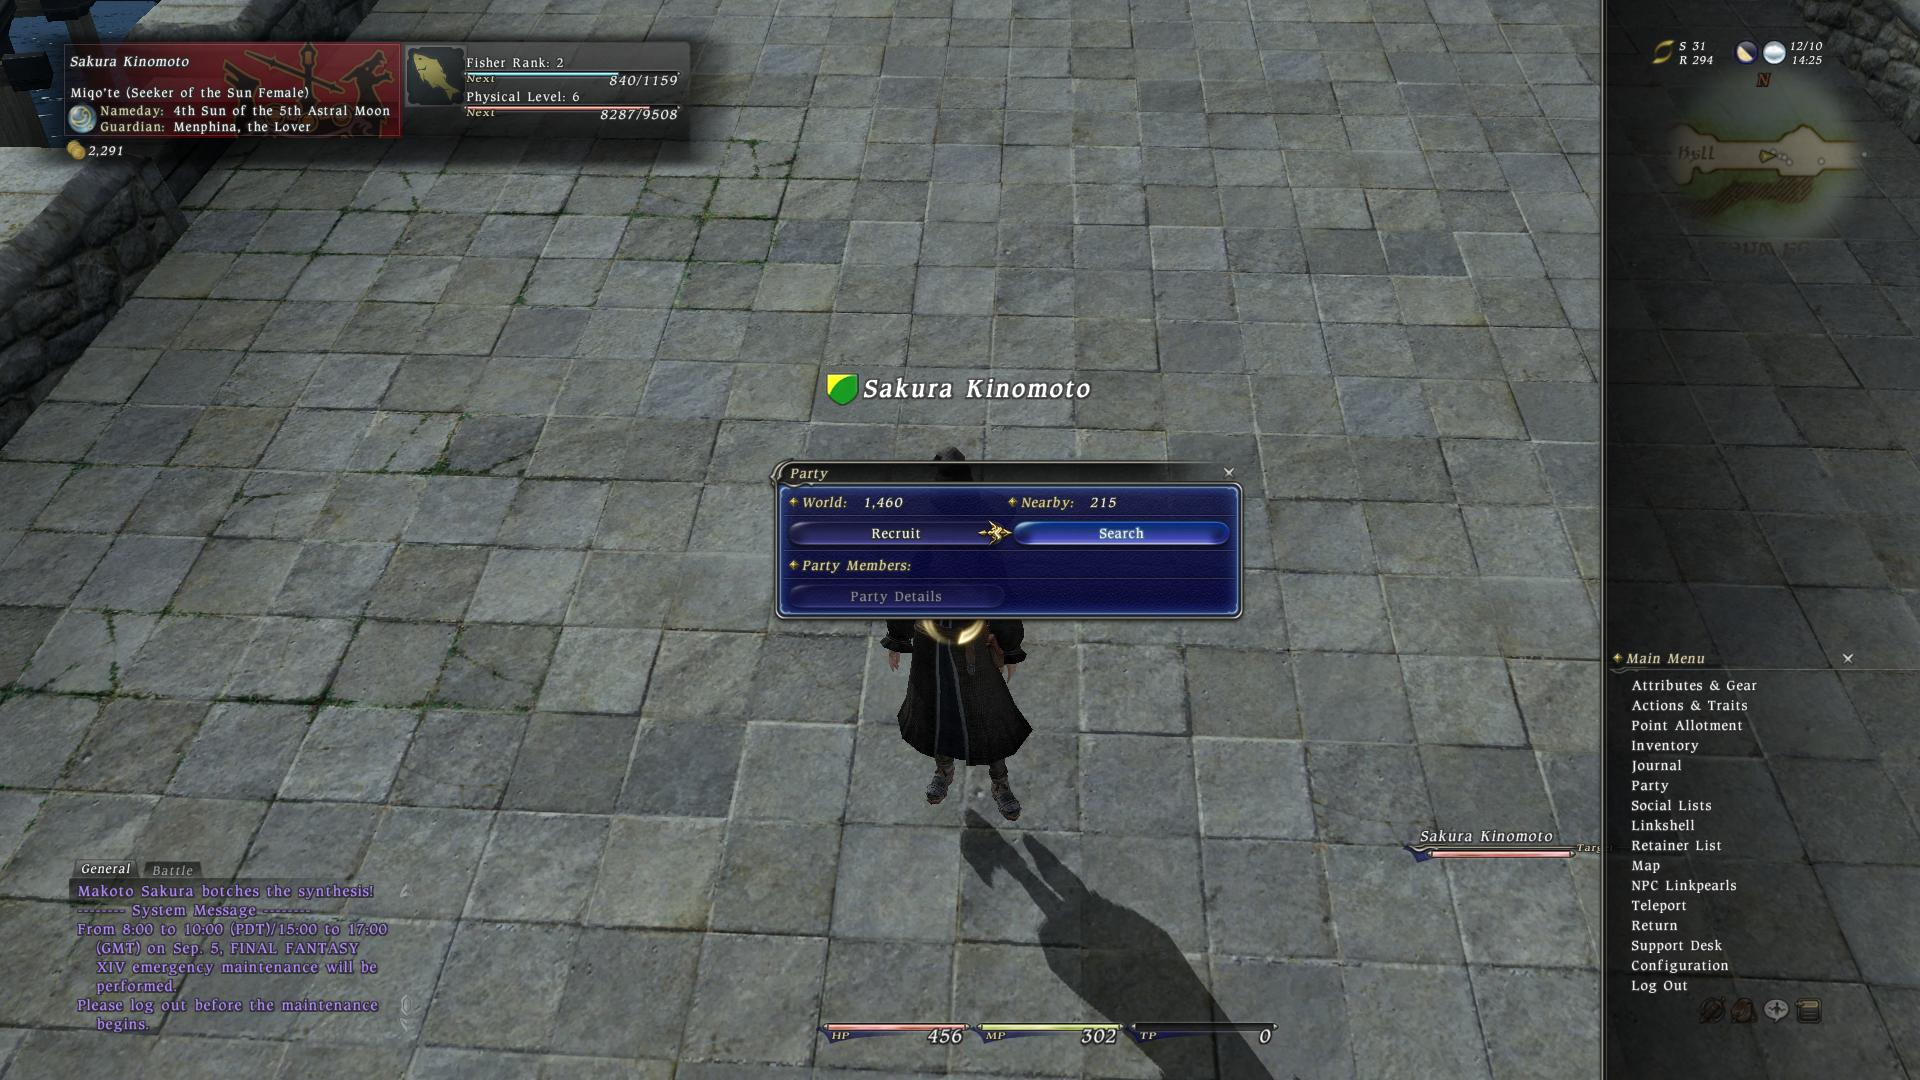 Final Fantasy XIV Daily Digest #2 - 09